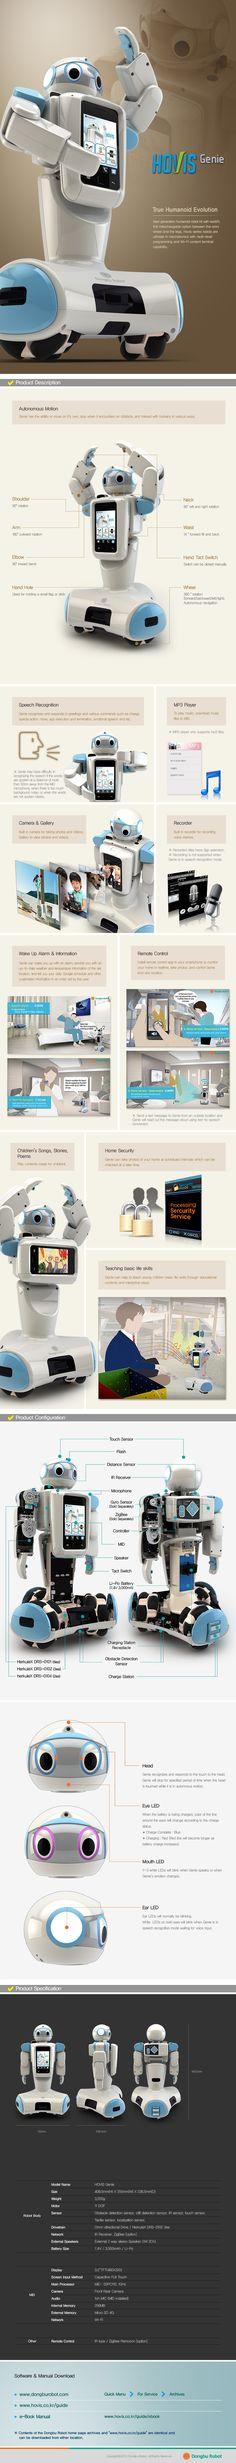 Dongbu Robot.